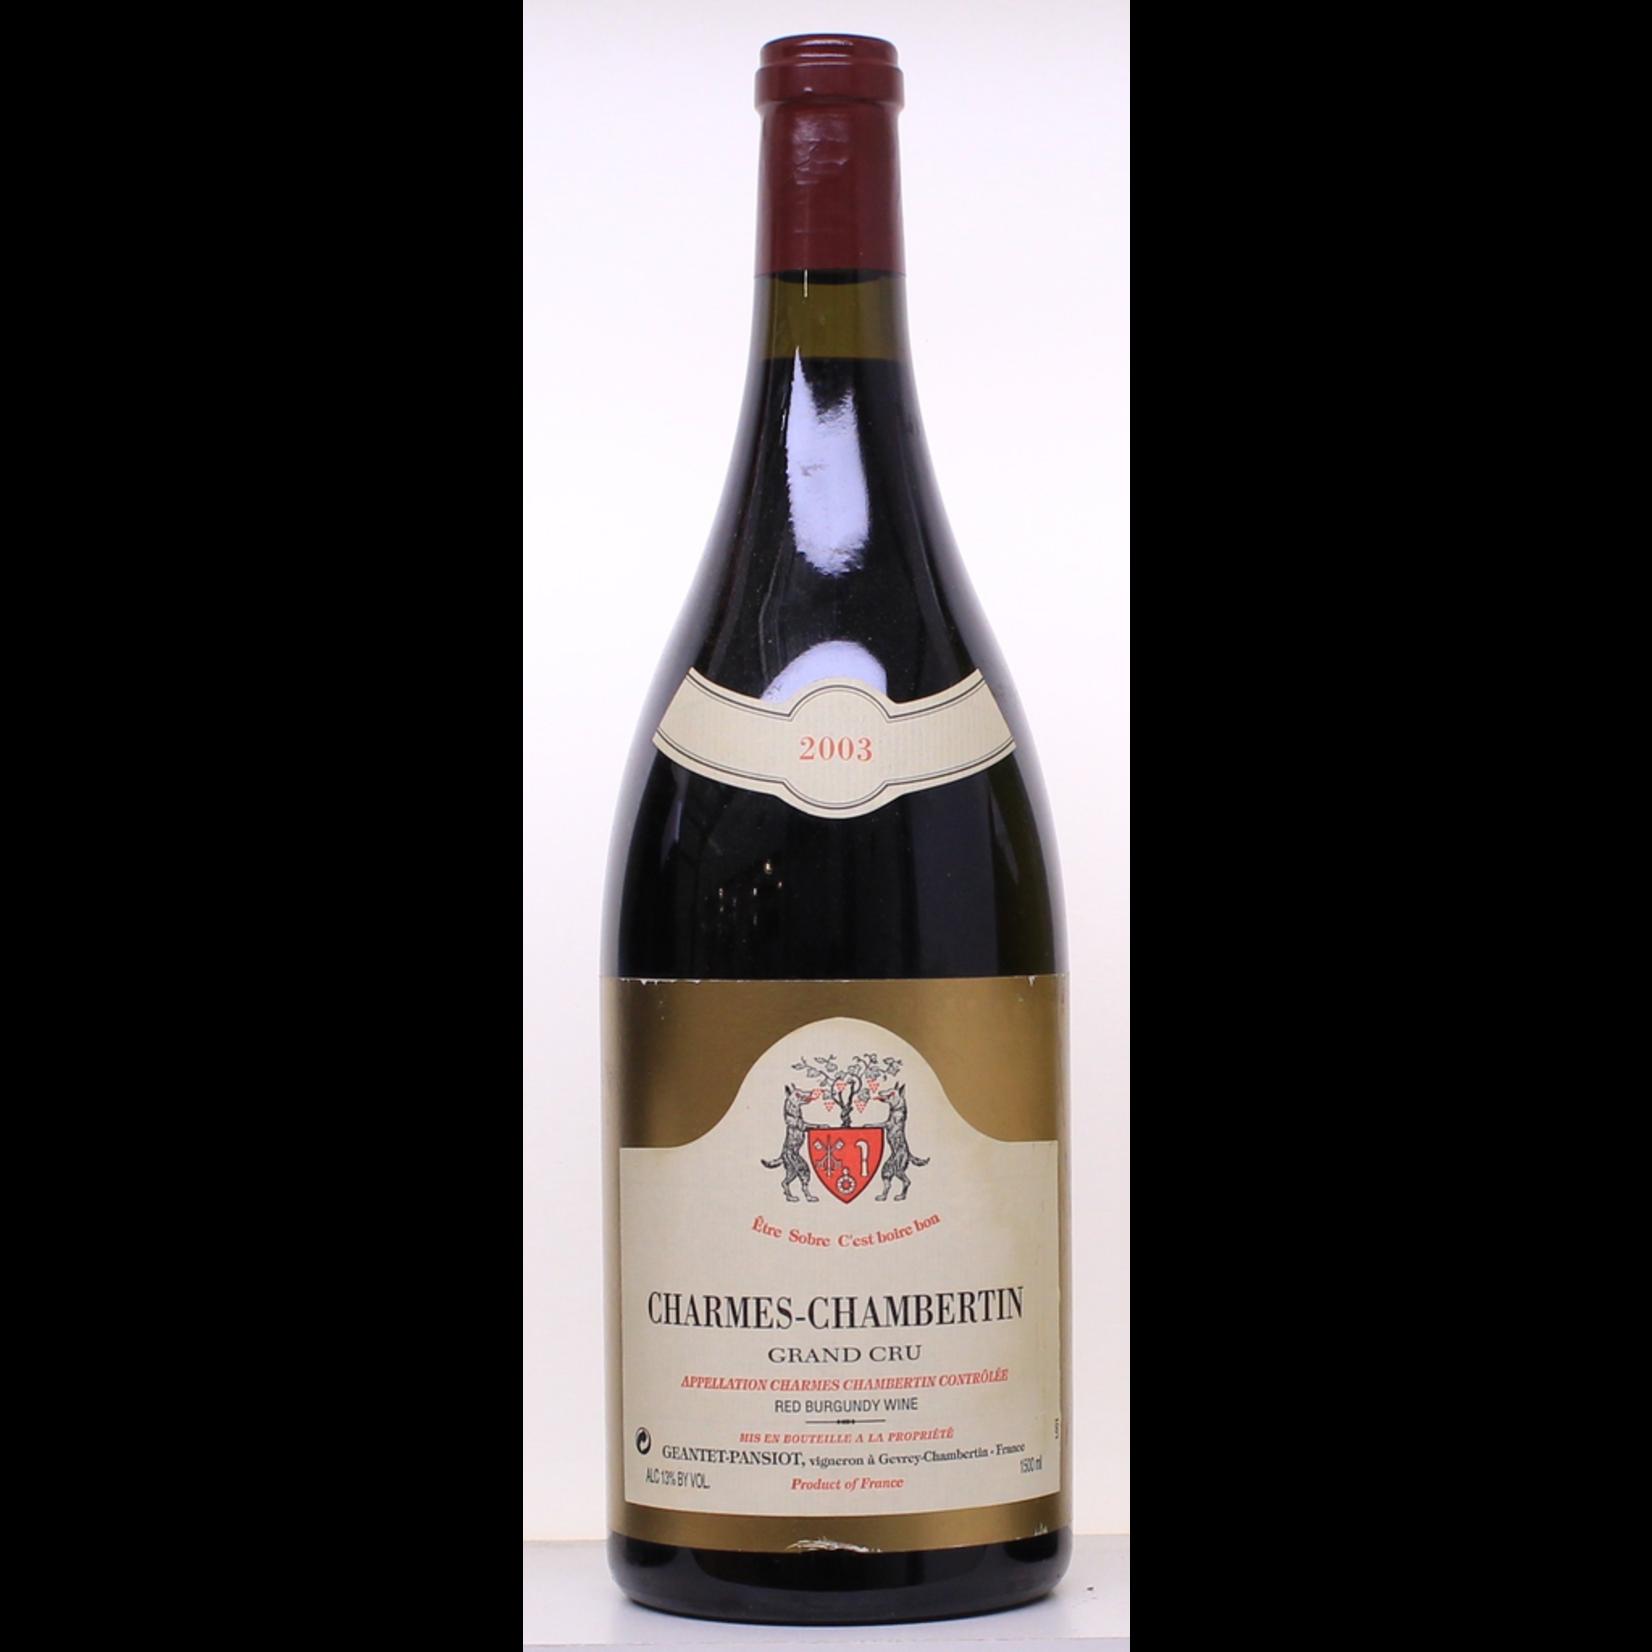 Wine Geantet-Pansiot Charmes Chambertin Grand Cru 2003 1.5L